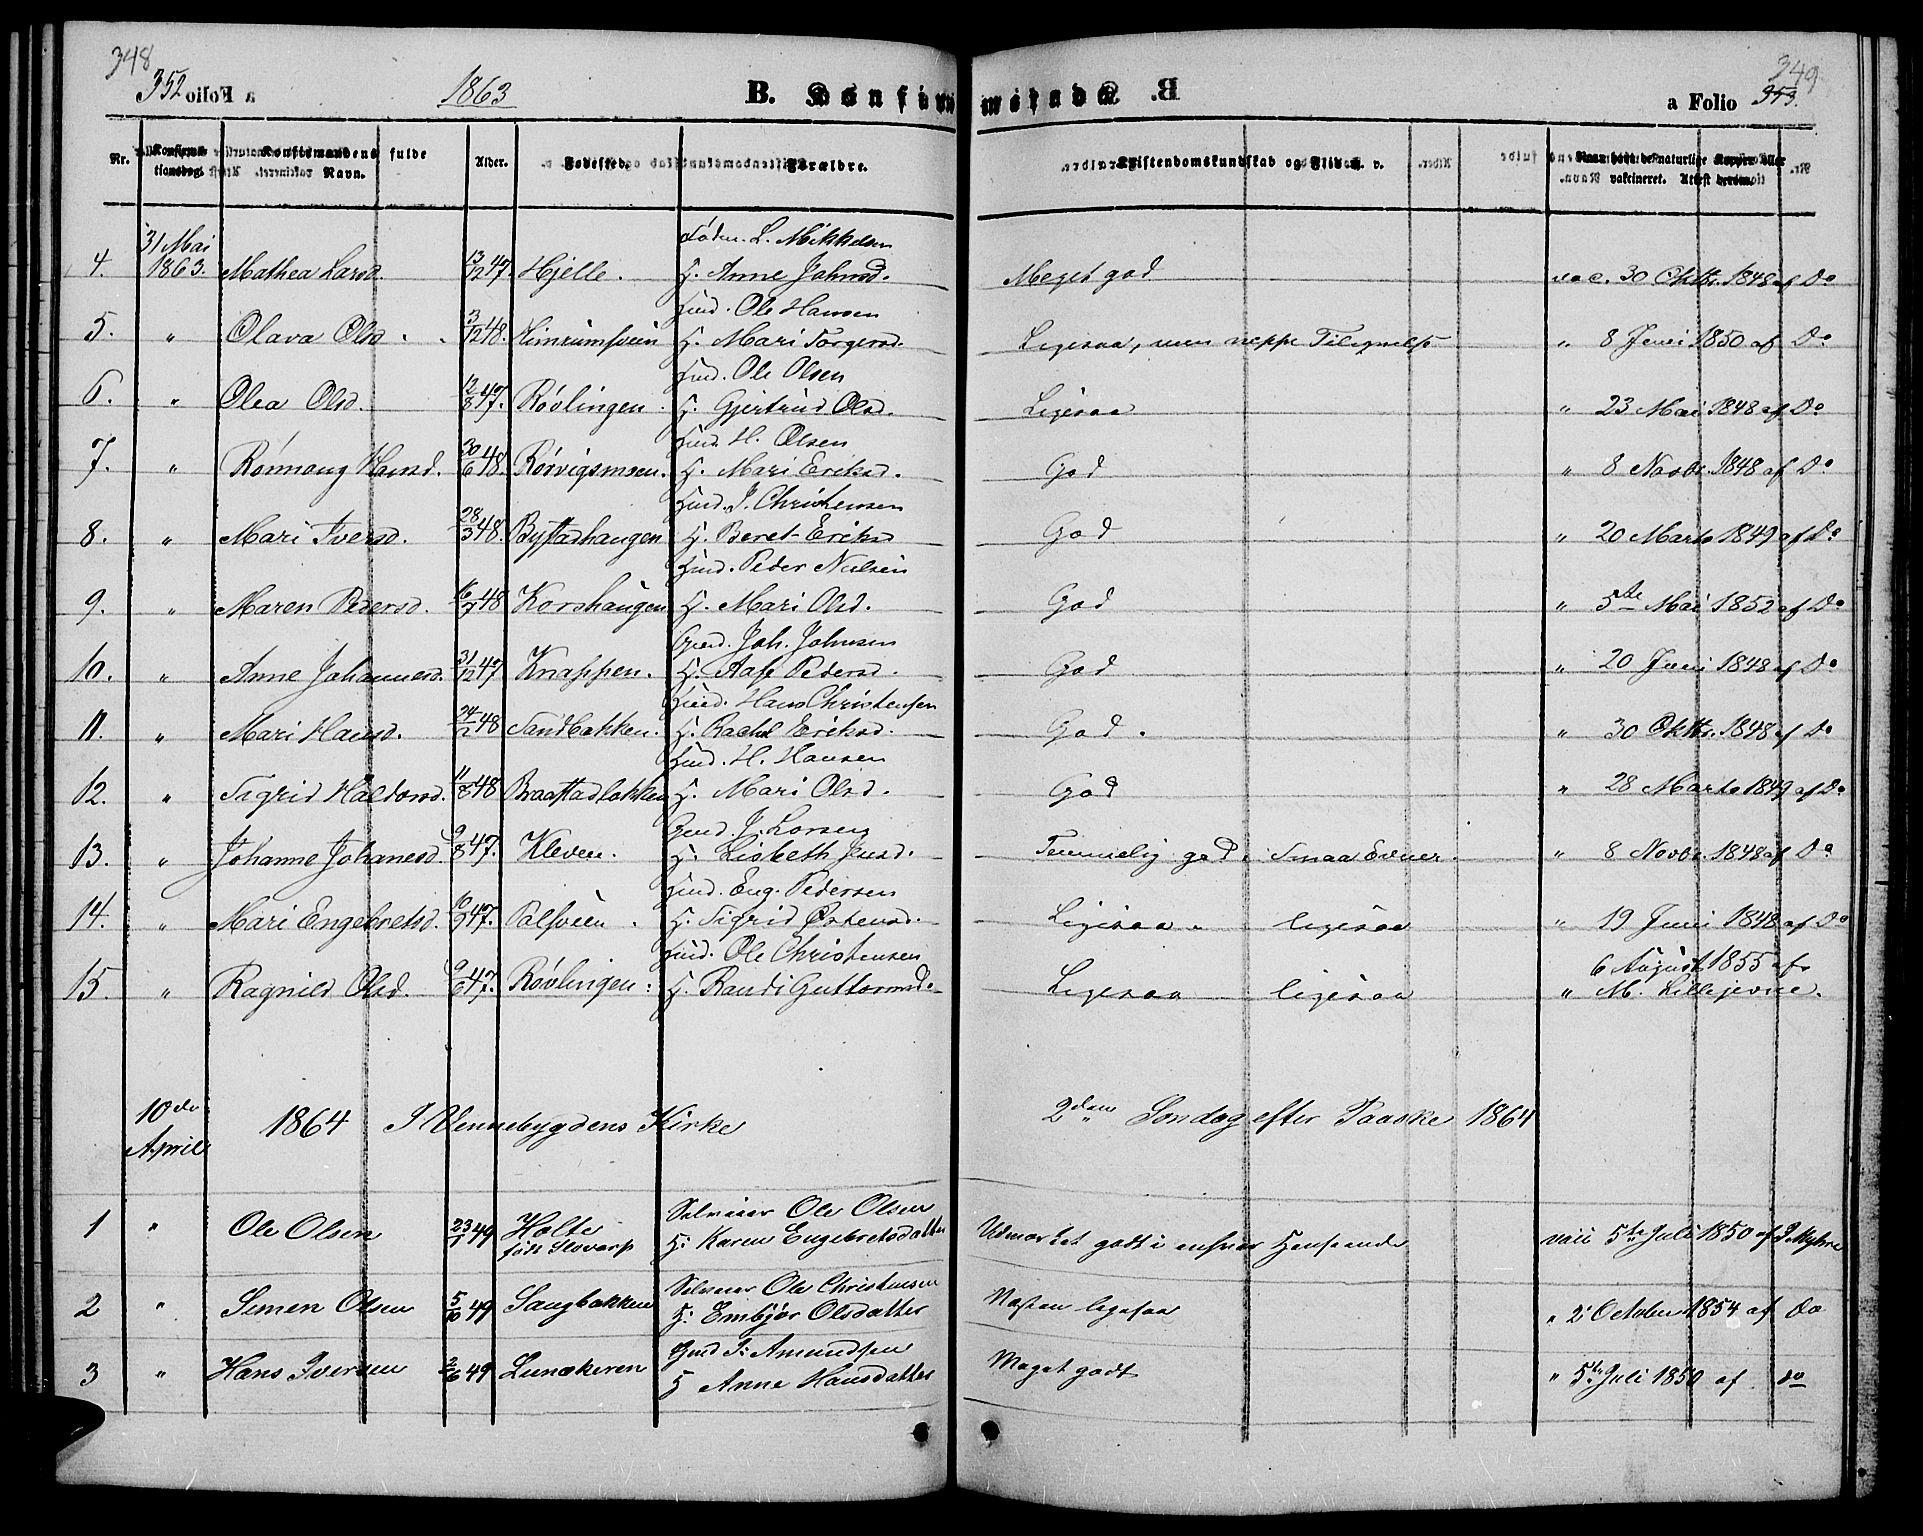 SAH, Ringebu prestekontor, Klokkerbok nr. 3, 1854-1866, s. 348-349